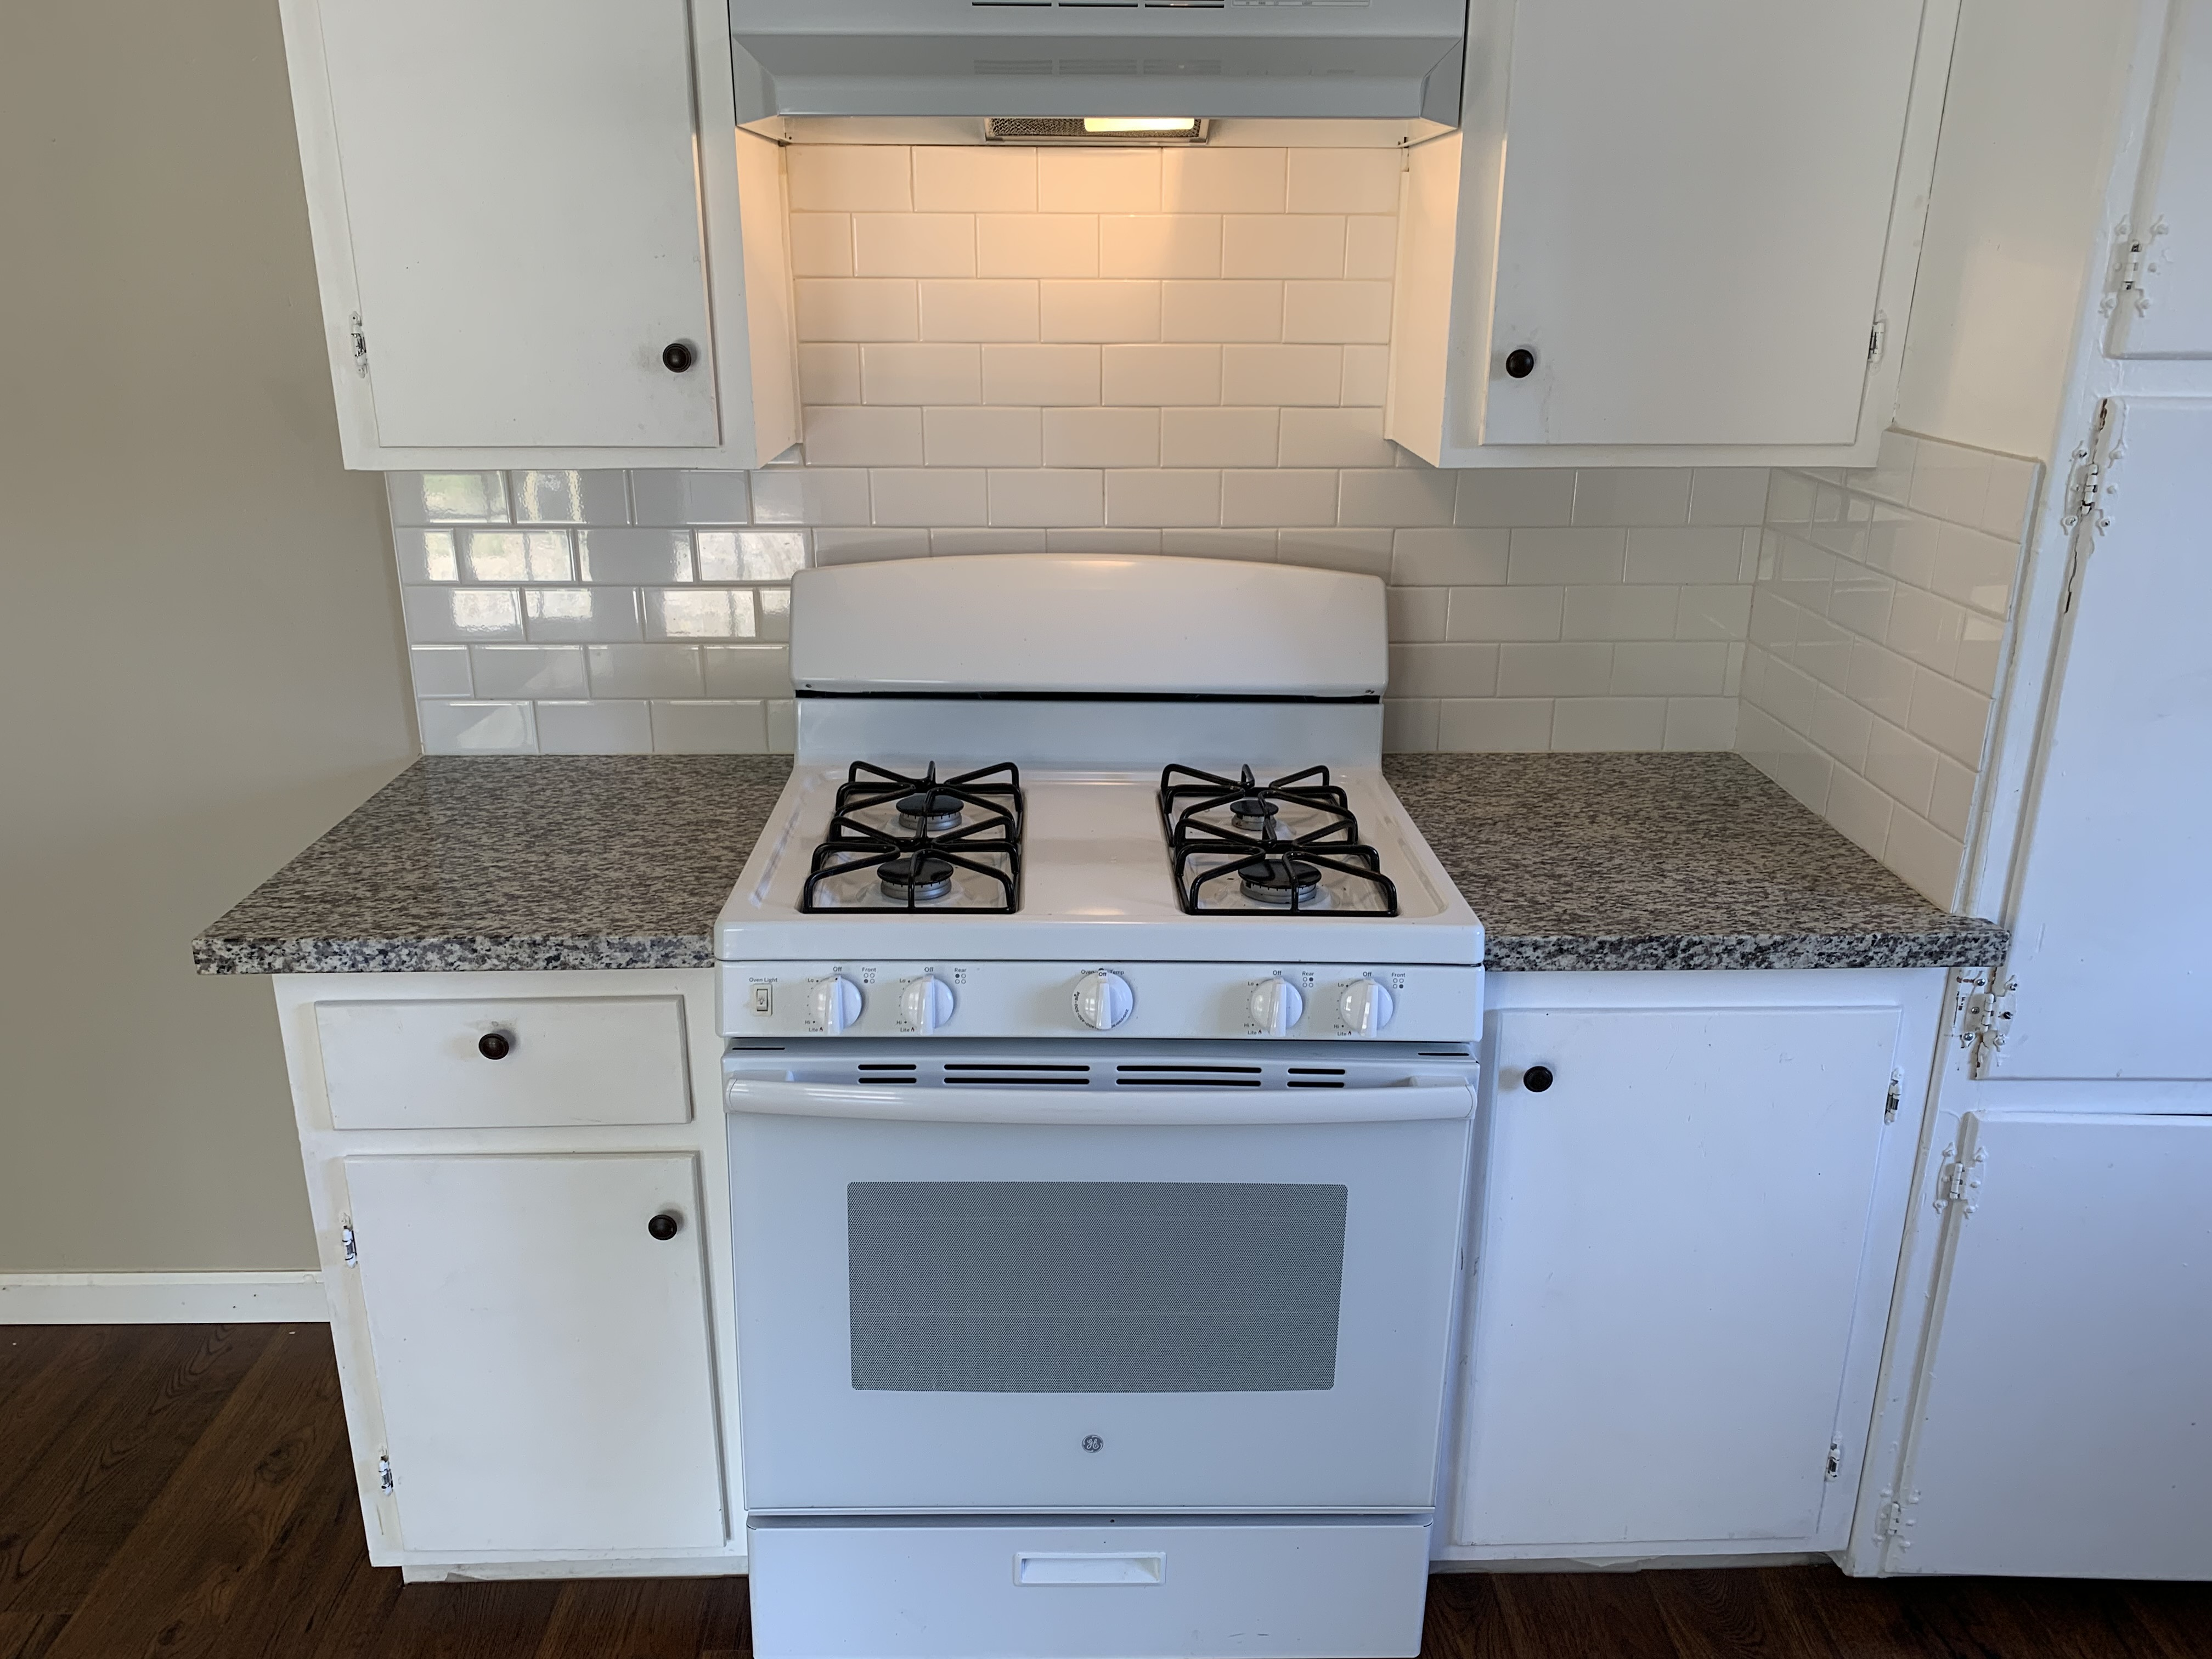 2114 Flint stove